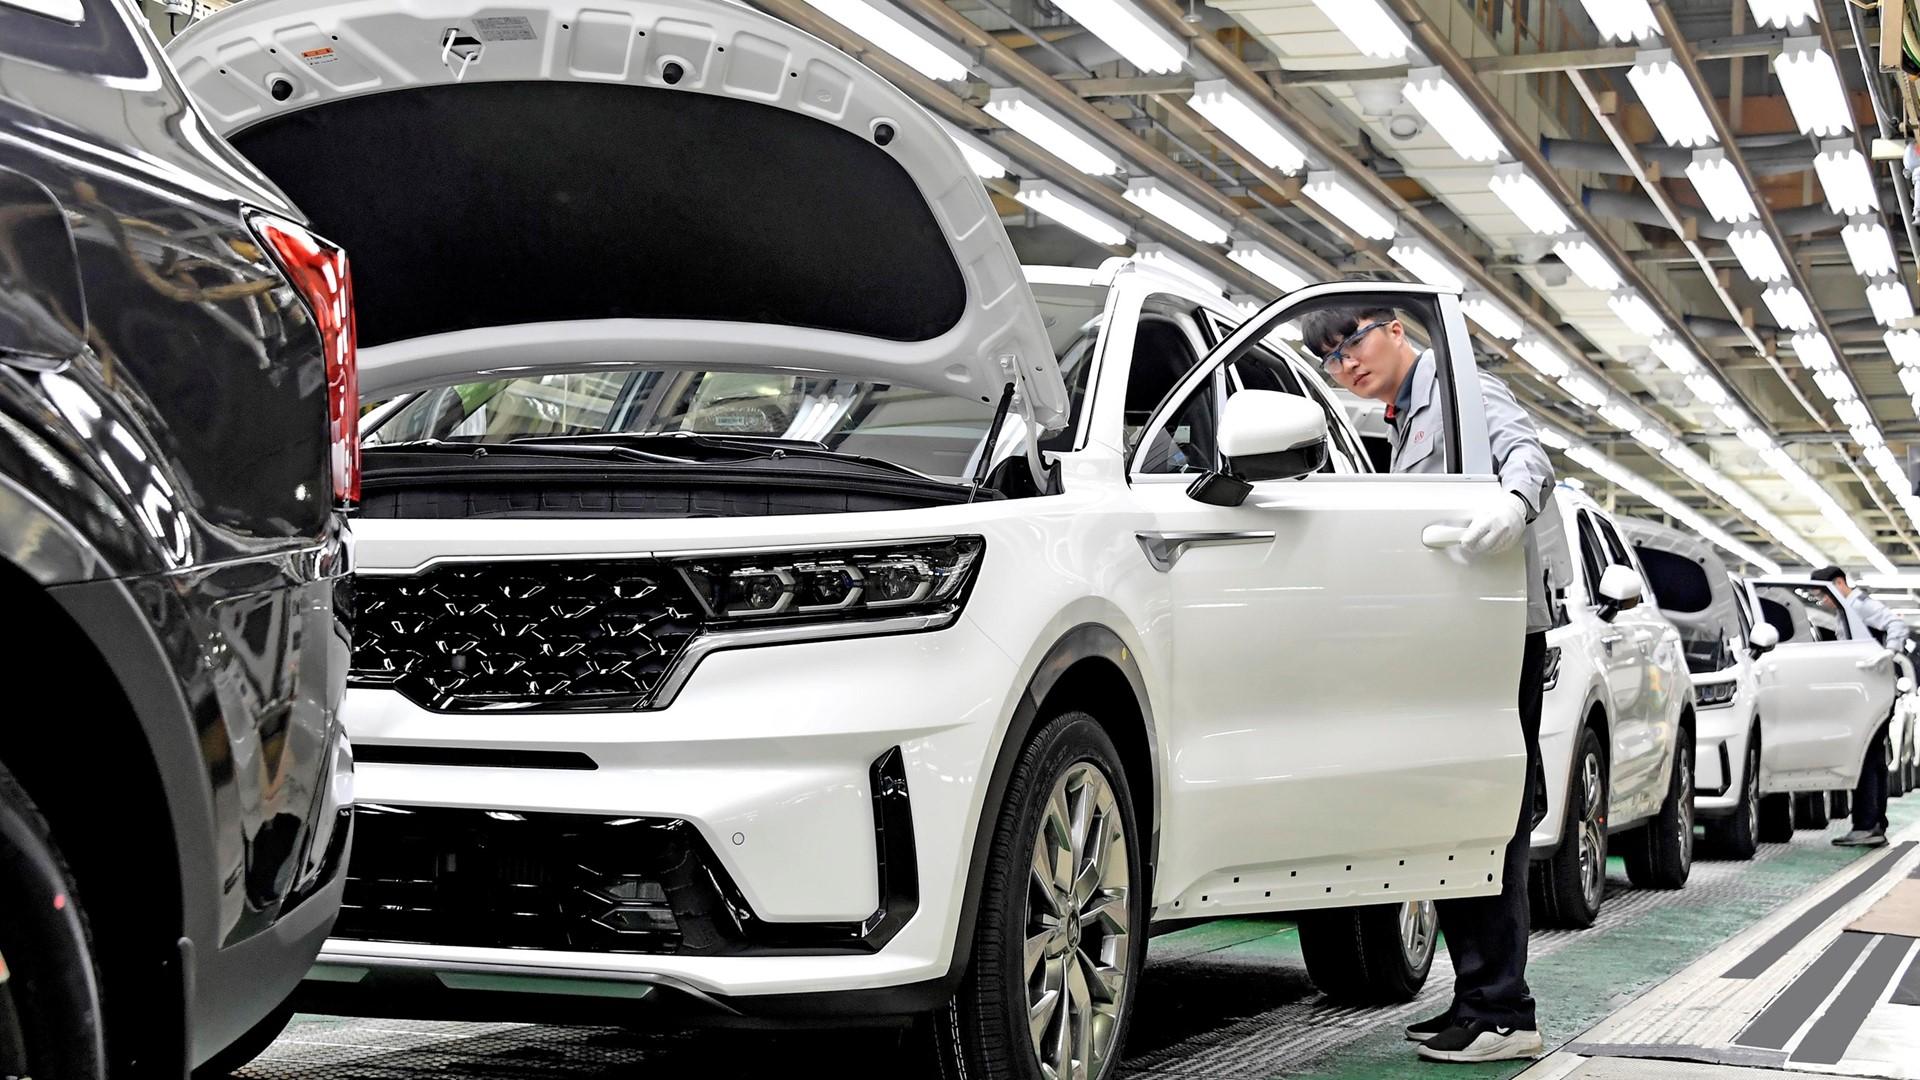 Start of production for new Kia Sorento Hybrid - Image 5